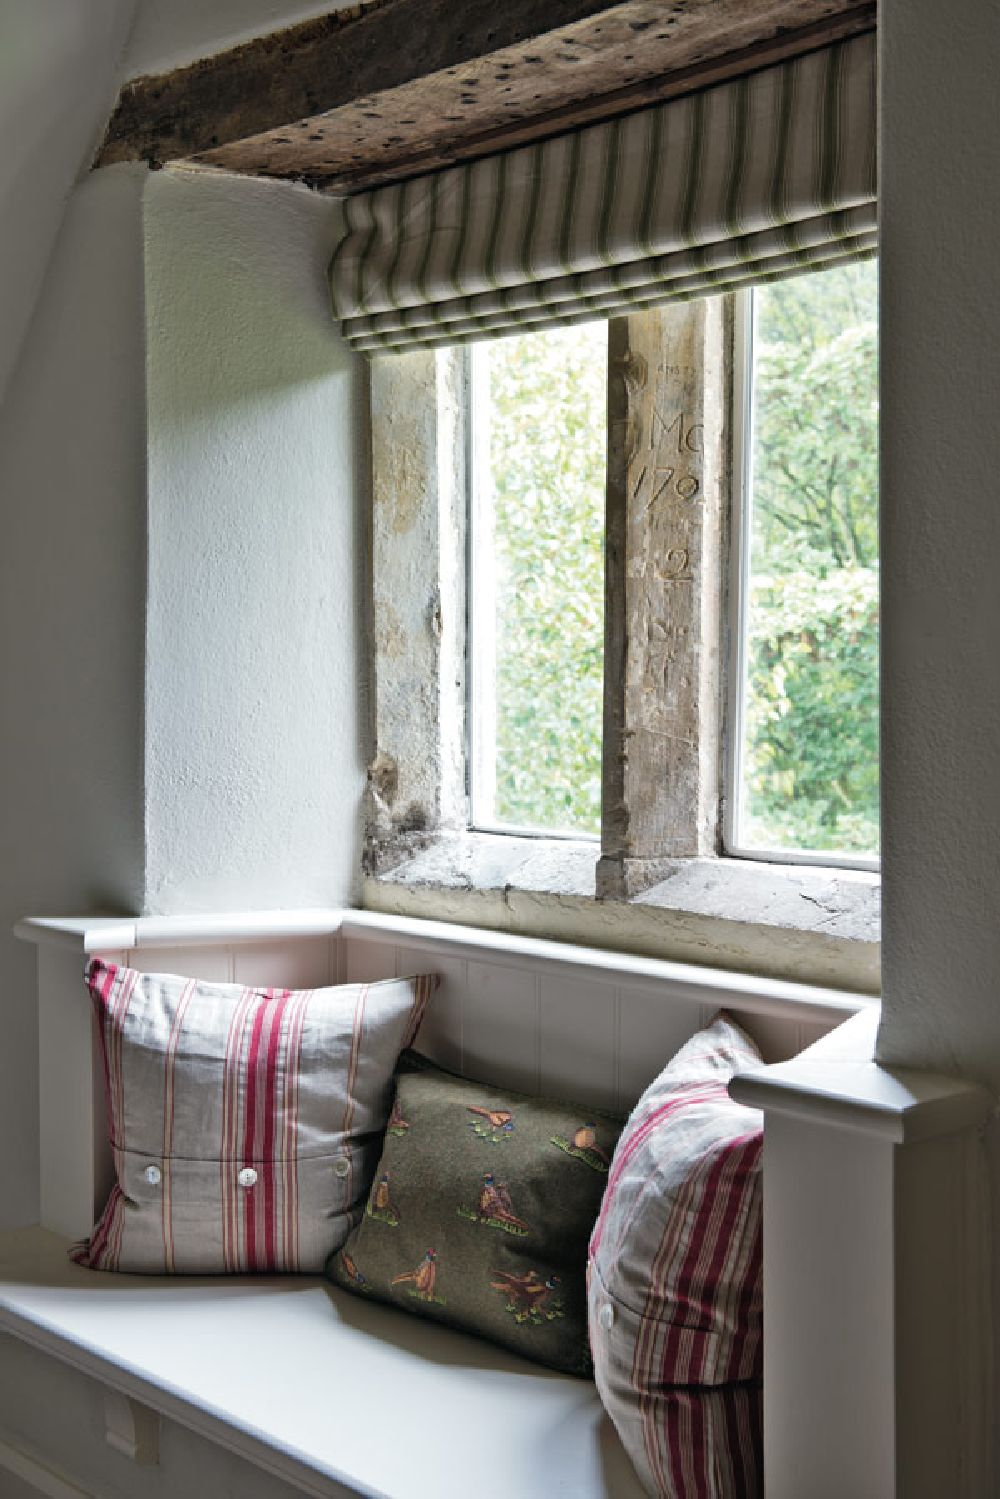 adelaparvu.com despre casa veche Anglia decorata in pasteluri, Design Interior Sims Hilditch Interior Design, Dorset Manor House, Foto Polly Eltes (12)